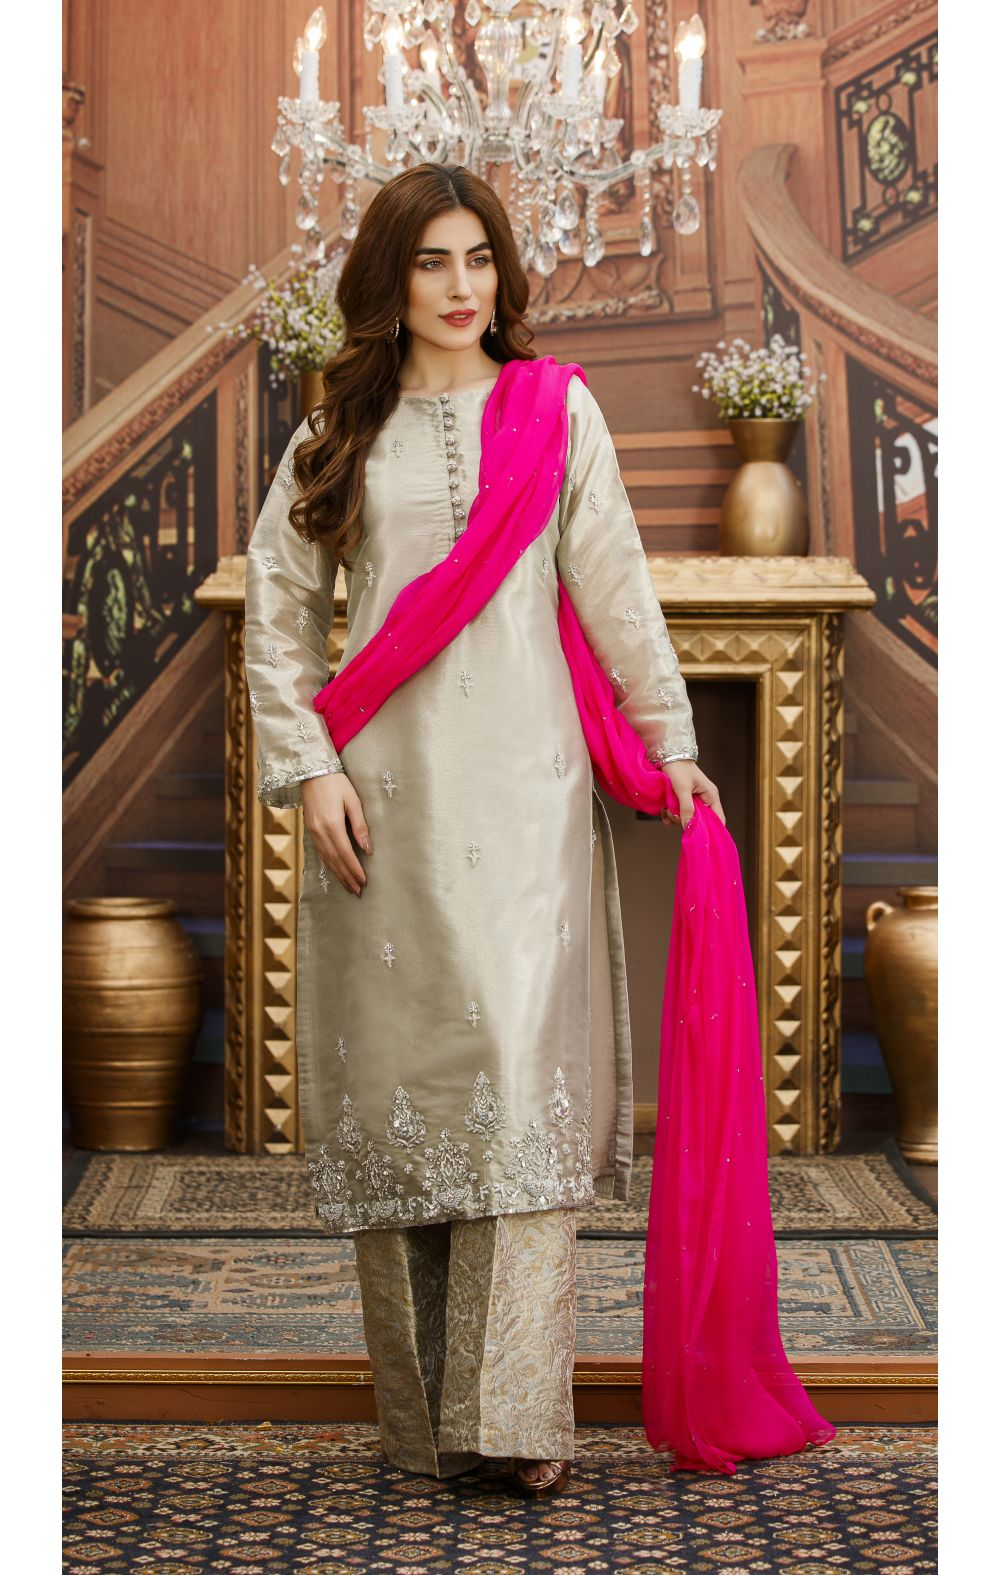 Wedding Party Dresses Pakistan Raveitsafe